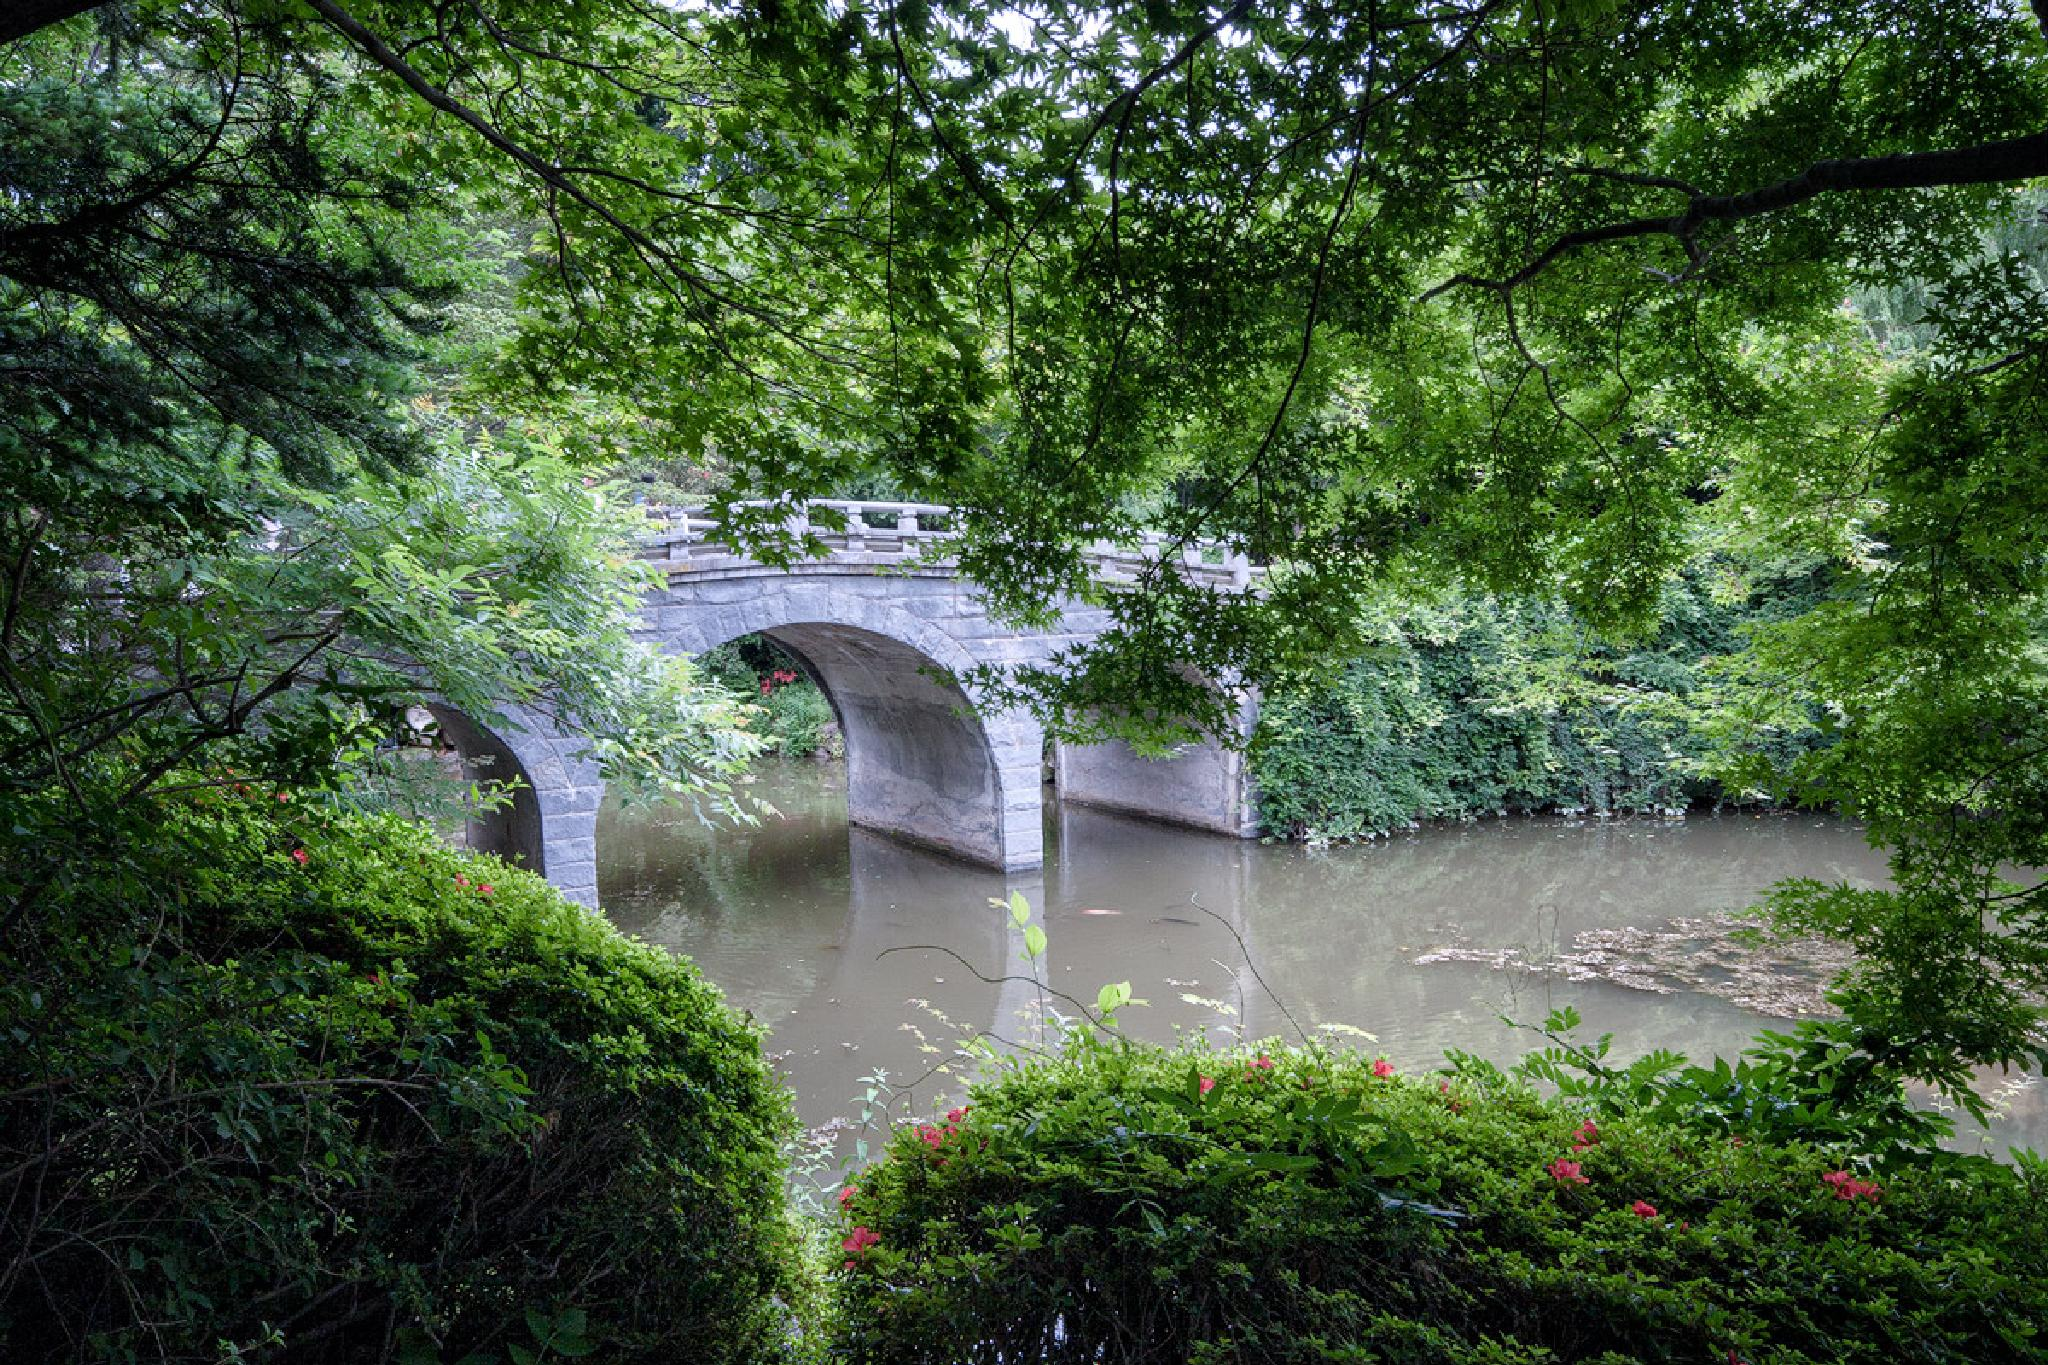 Bridge Over Calm Waters by dinajona